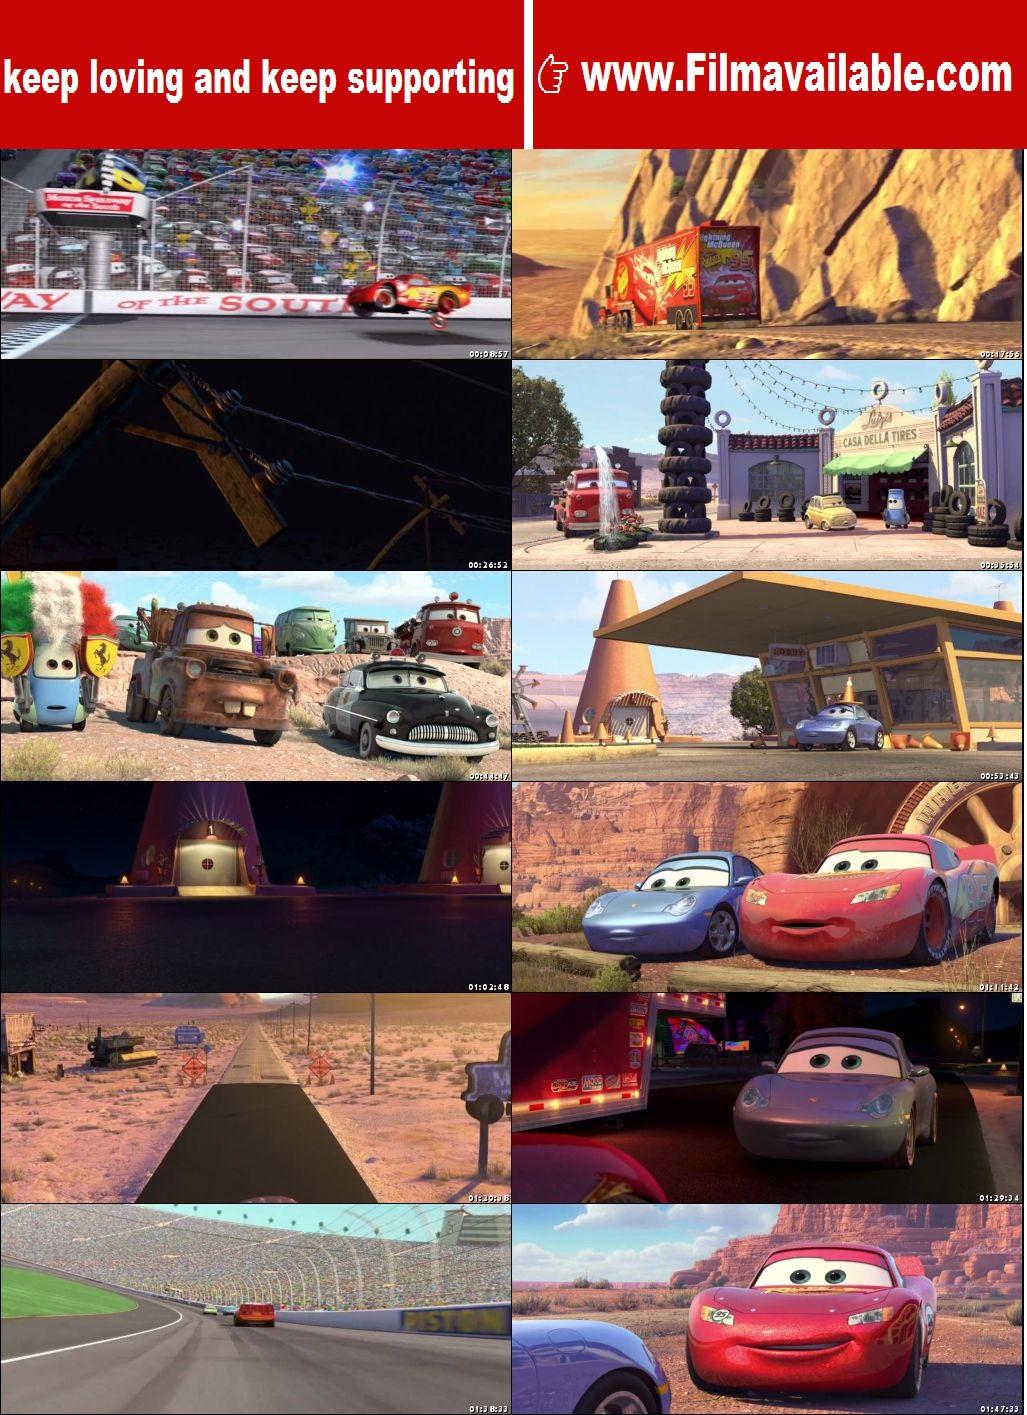 Cars 2006 Full Movie Download Dual Audio Hindi Dubbed 720p Brrip